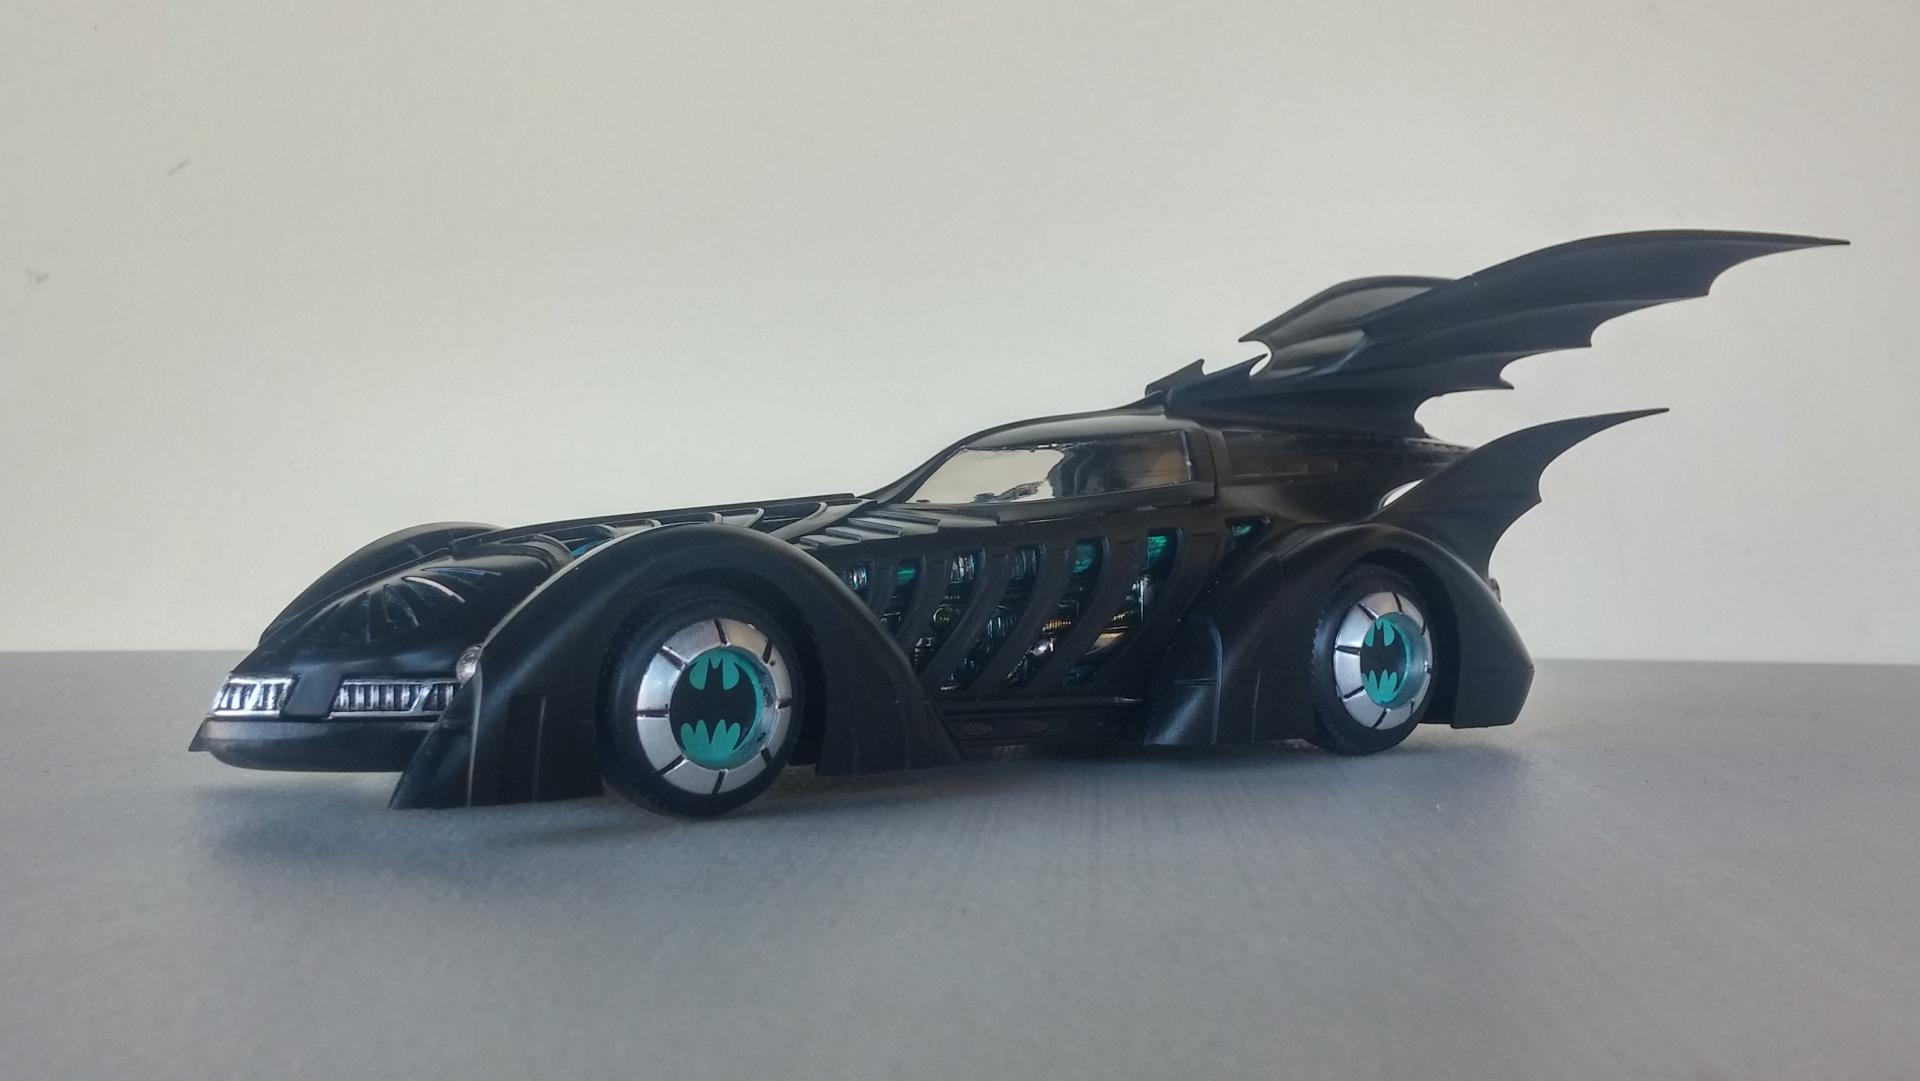 Batmobile_95_14.thumb.jpg.5c5aa48cdd264654731a06f7c3435d13.jpg